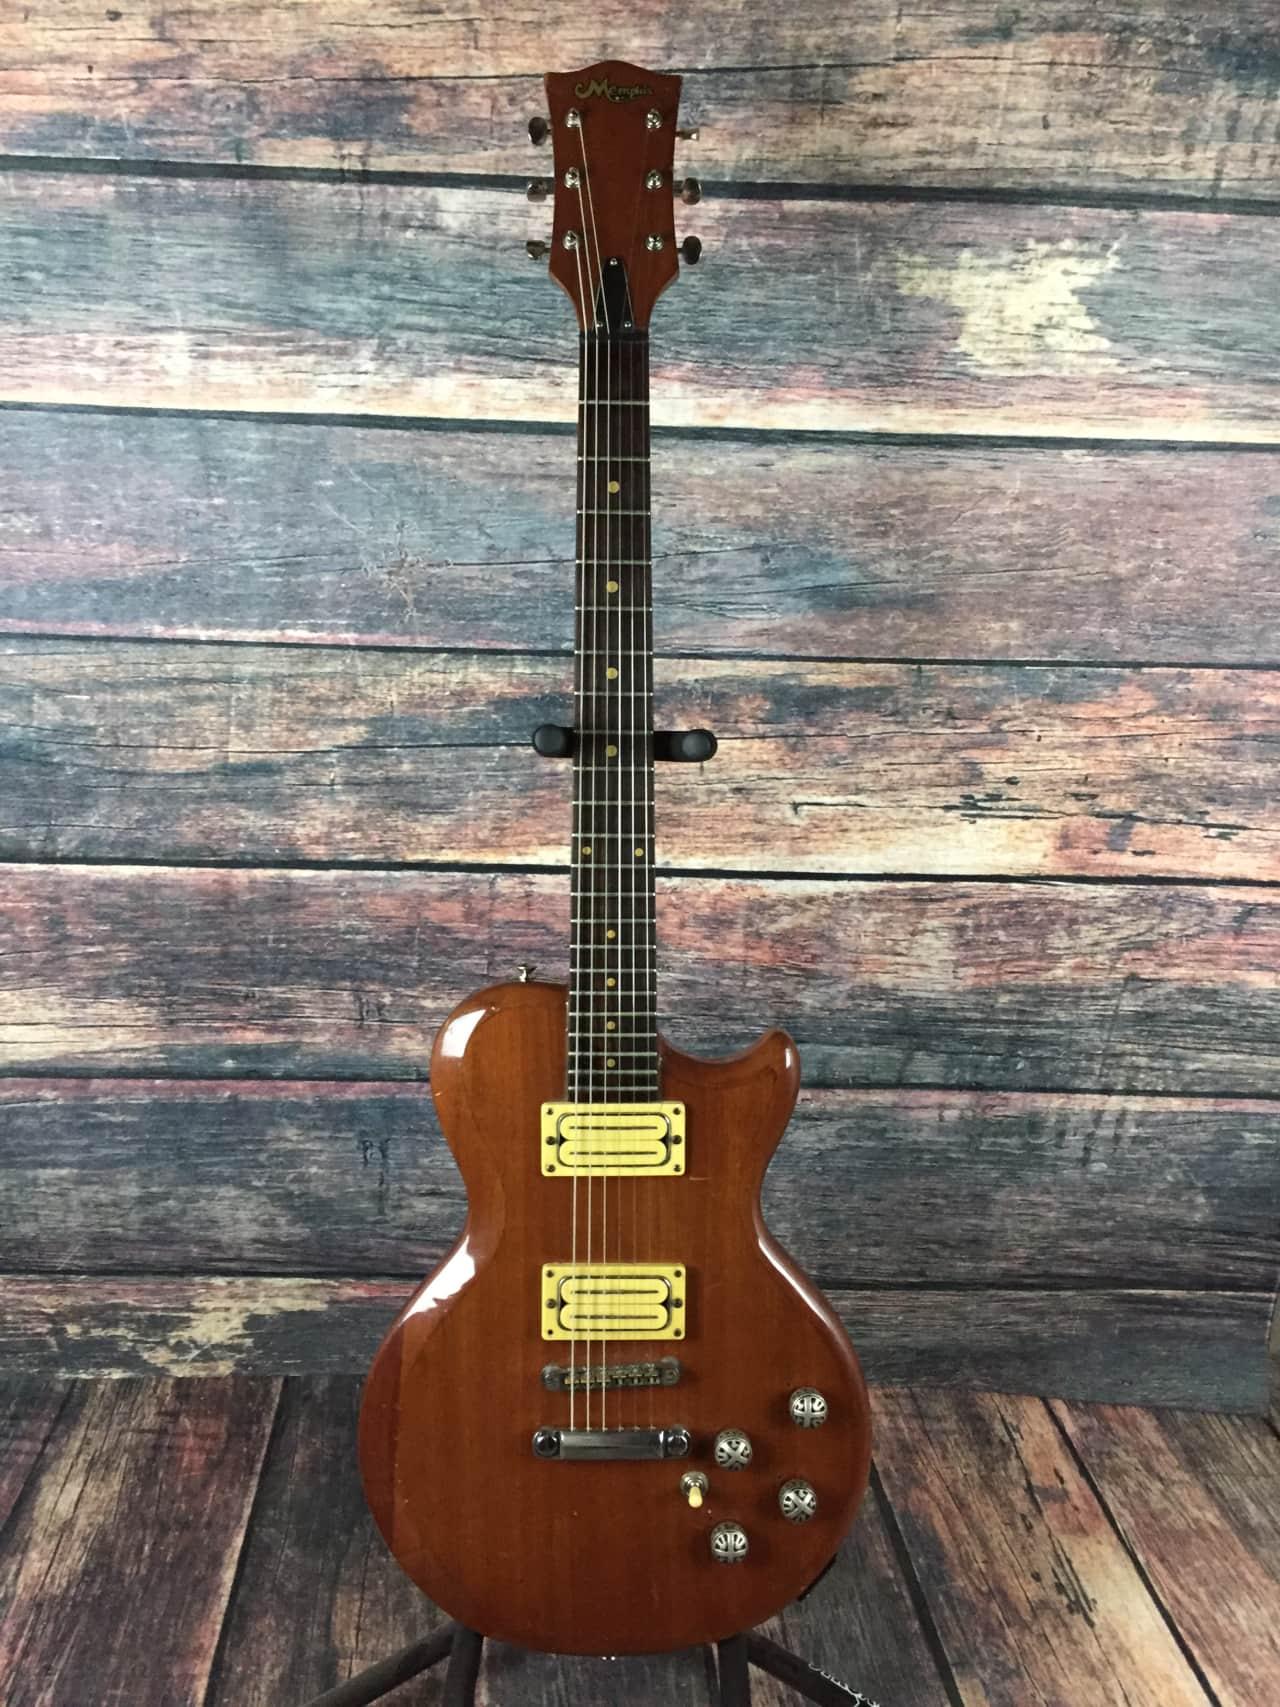 memphis singlecut electric guitar 70 39 s made in japan reverb. Black Bedroom Furniture Sets. Home Design Ideas